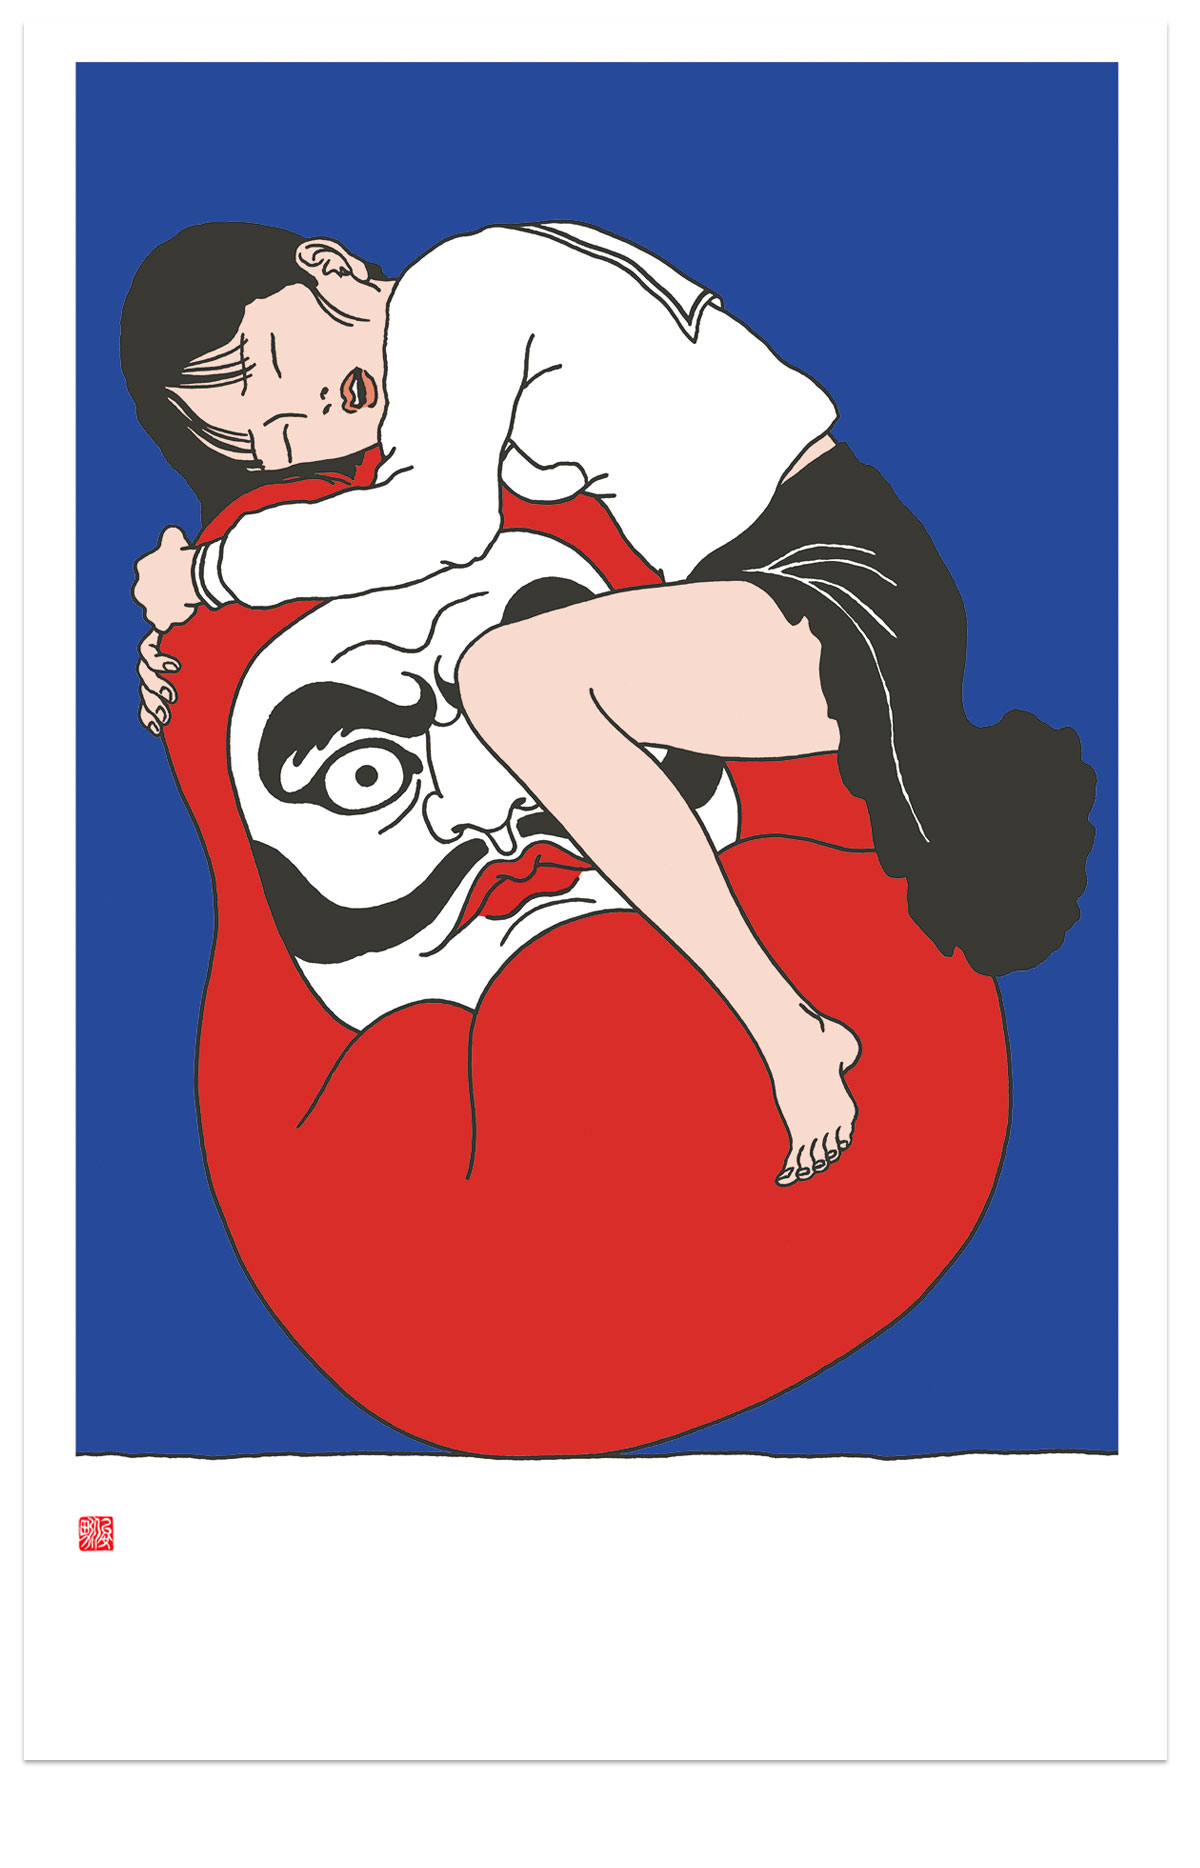 Toshio Saeki Ureshidaruma , 2016Silkscreen print. Stamped edition of 100.Inc. S/N Certificate. 24 x 34 in. unframed